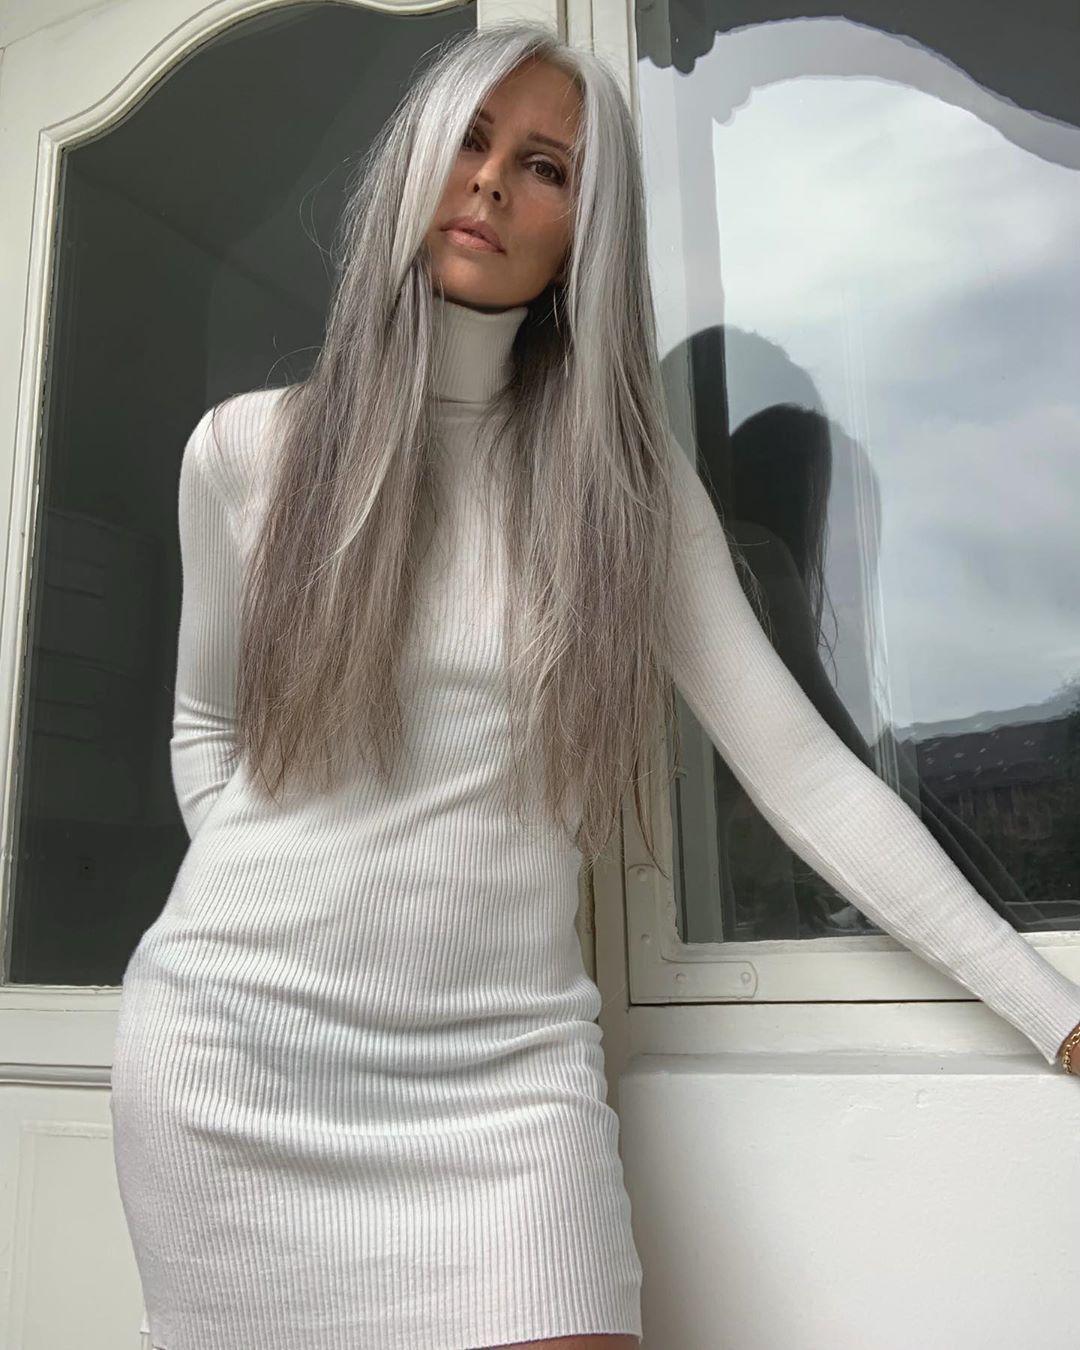 28b83679e49f89135f0fc8898dc682b2 - How Long Does It Take To Get White Hair